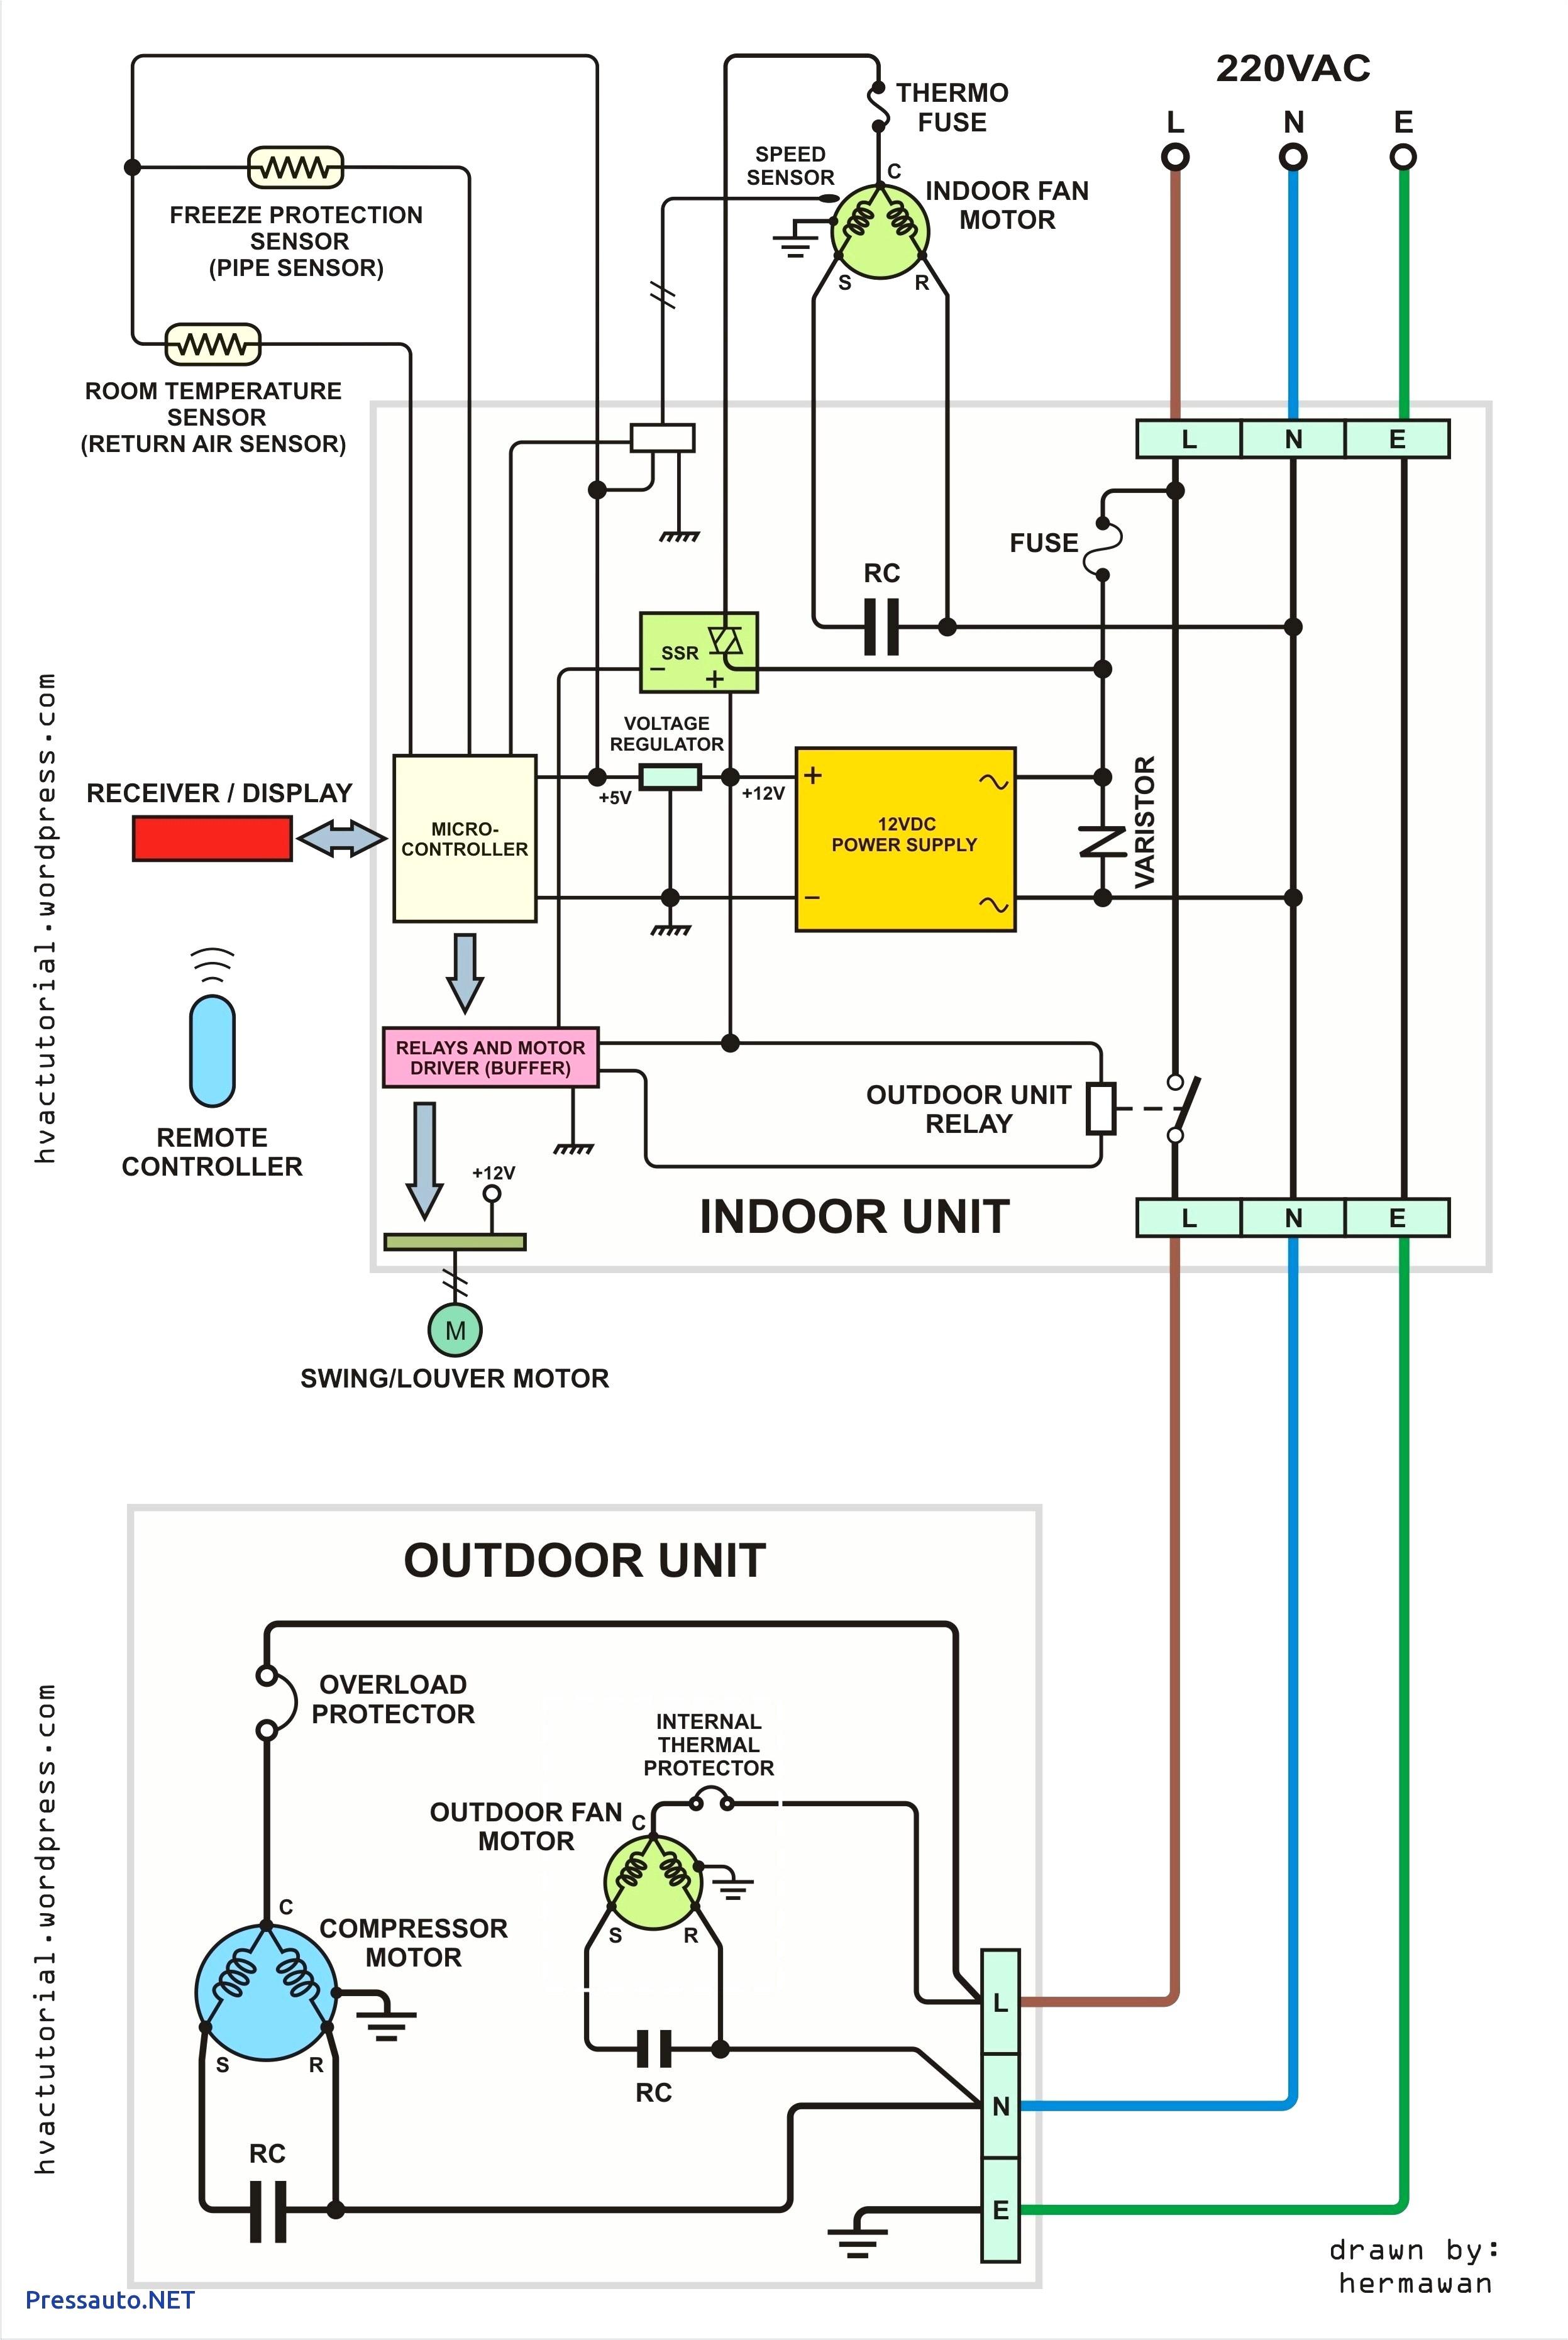 jayco trailer wiring diagram within suburban rv furnace